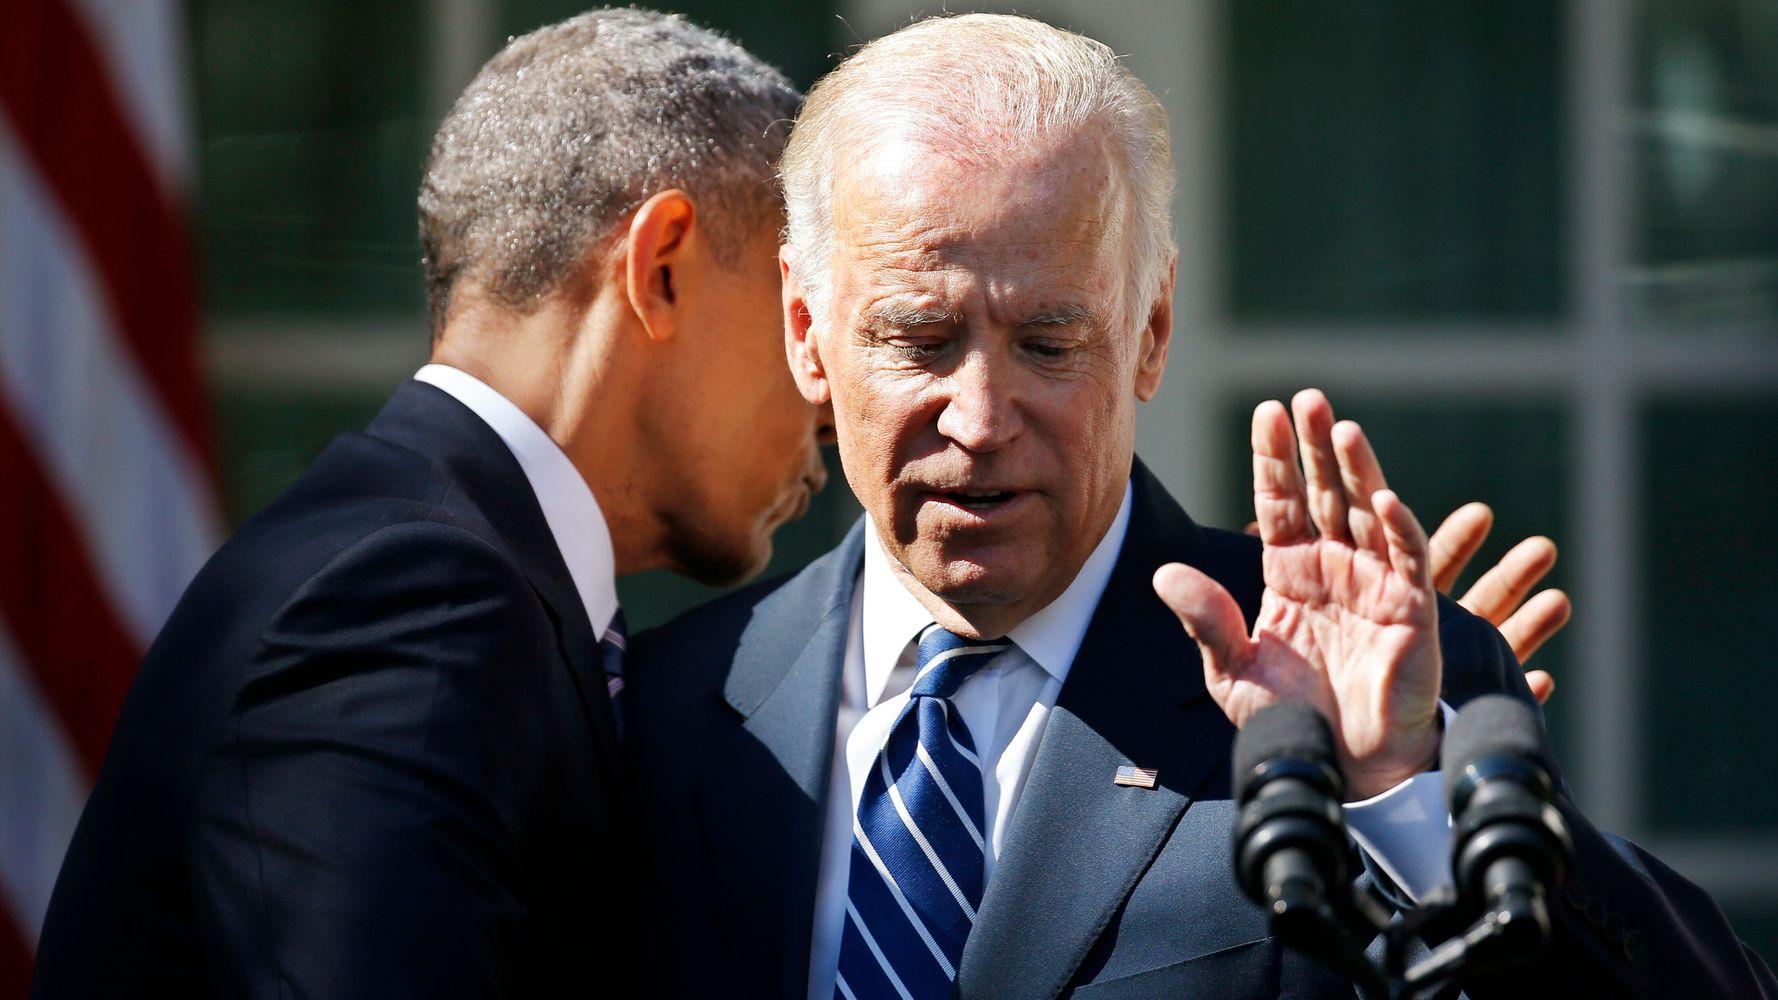 Big Tech Is The New Big Tobacco And Joe Biden Doesn't Get It